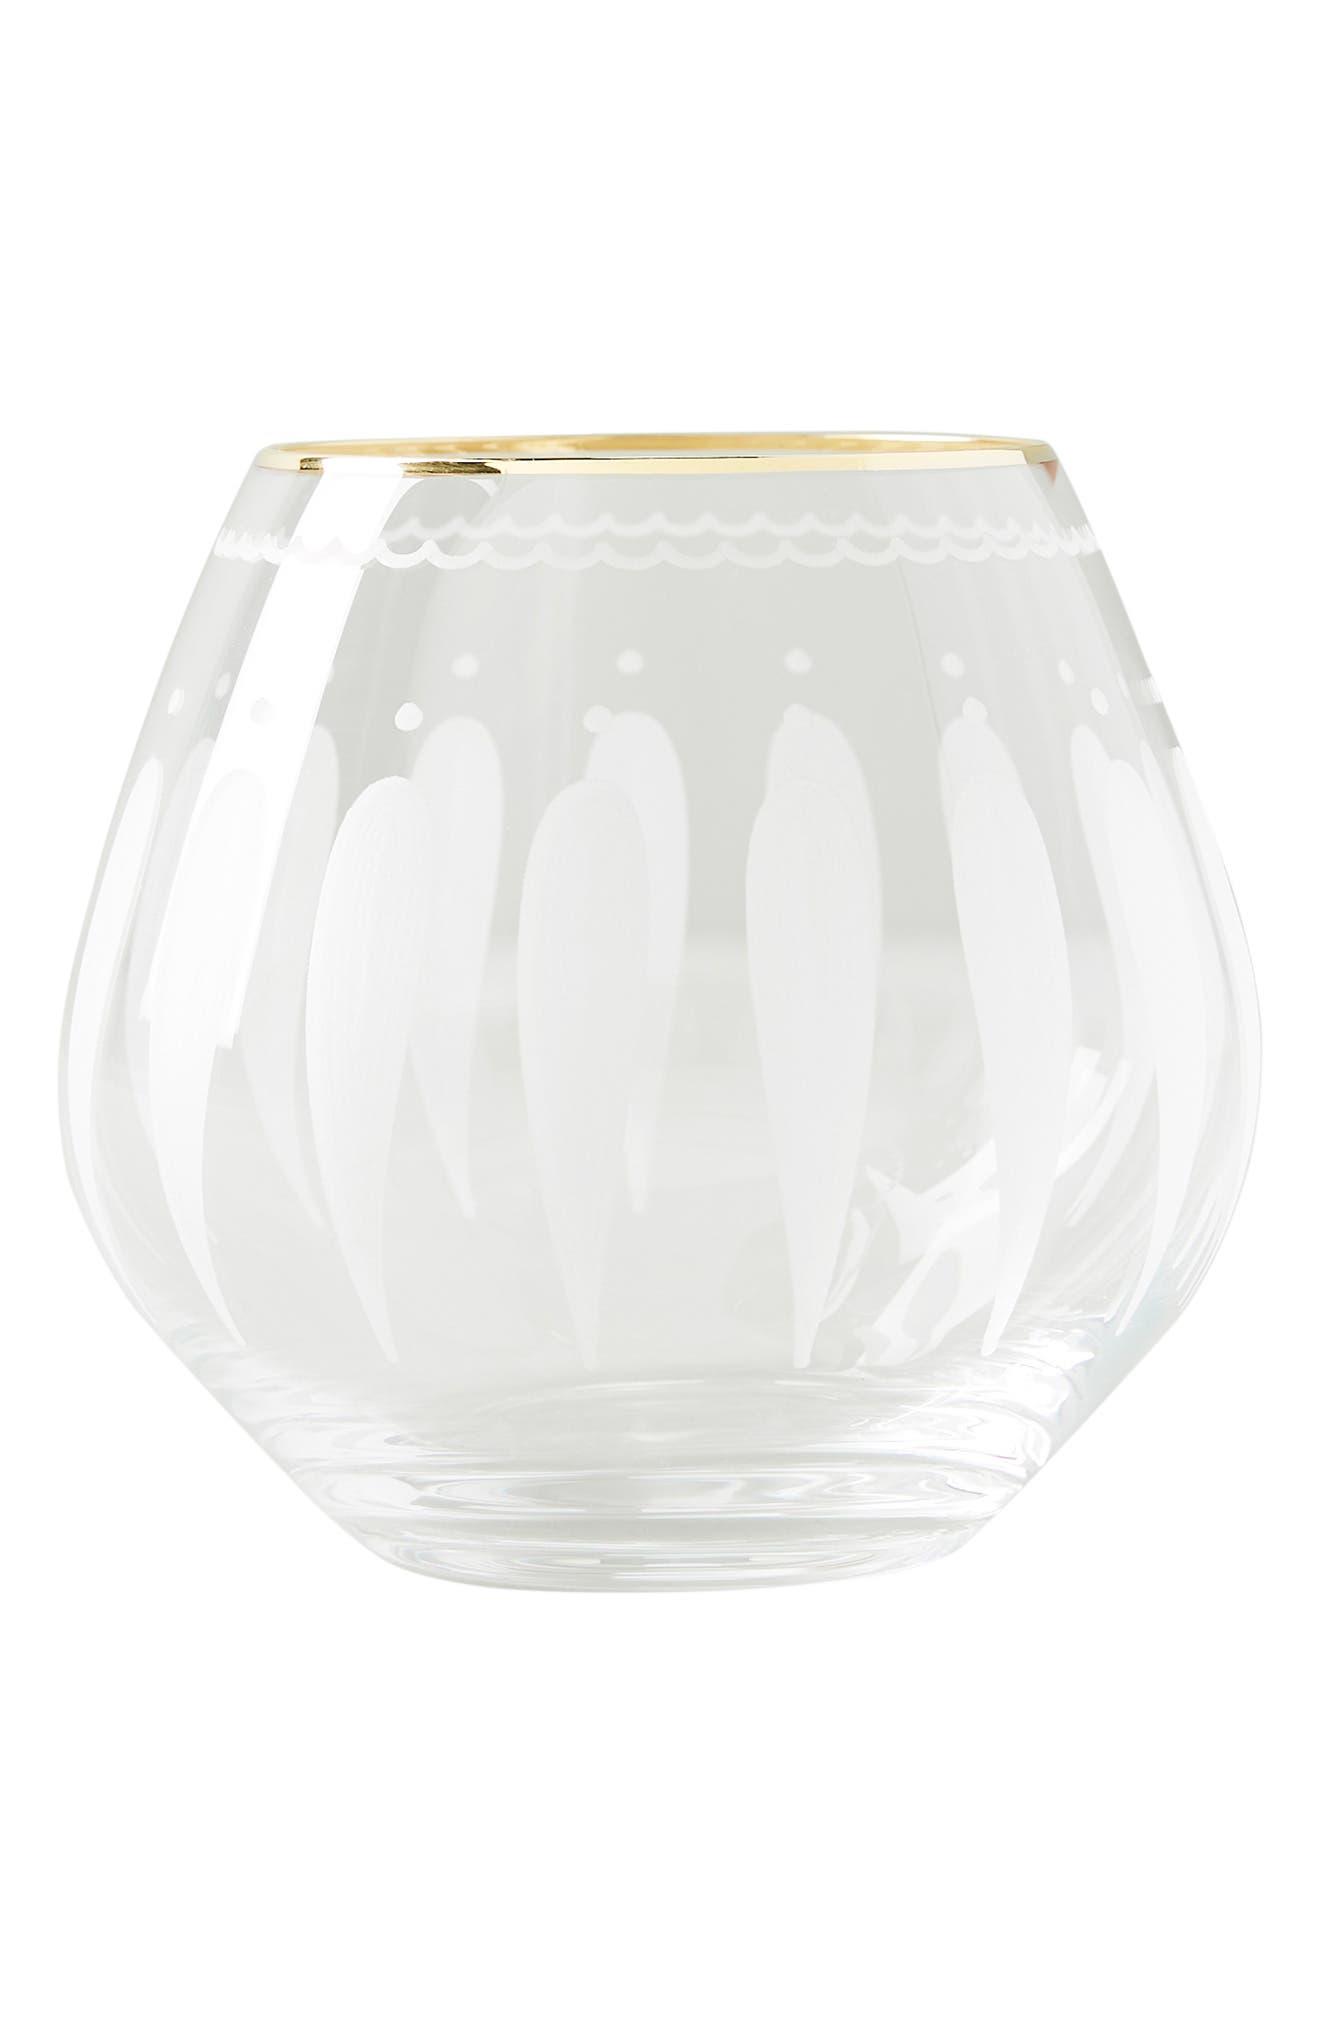 Odele Set of 4 Stemless Wine Glasses,                             Alternate thumbnail 4, color,                             CLEAR